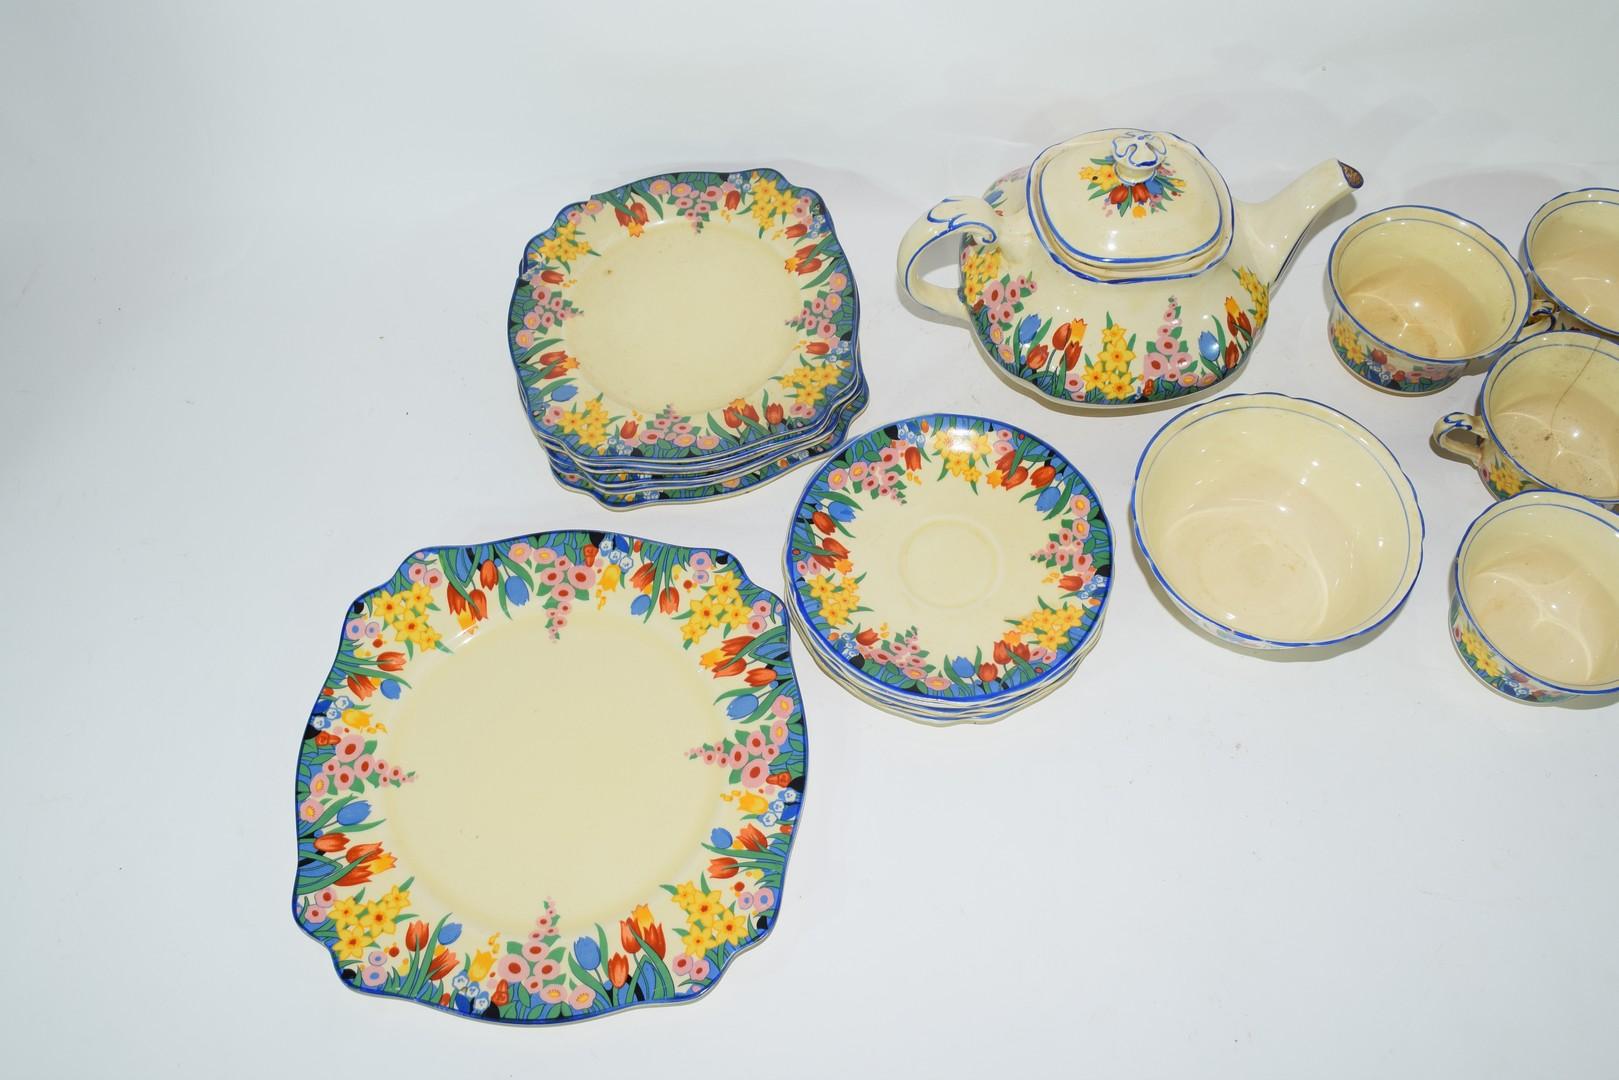 Clarice Cliff Bizarre tea set - Image 3 of 4